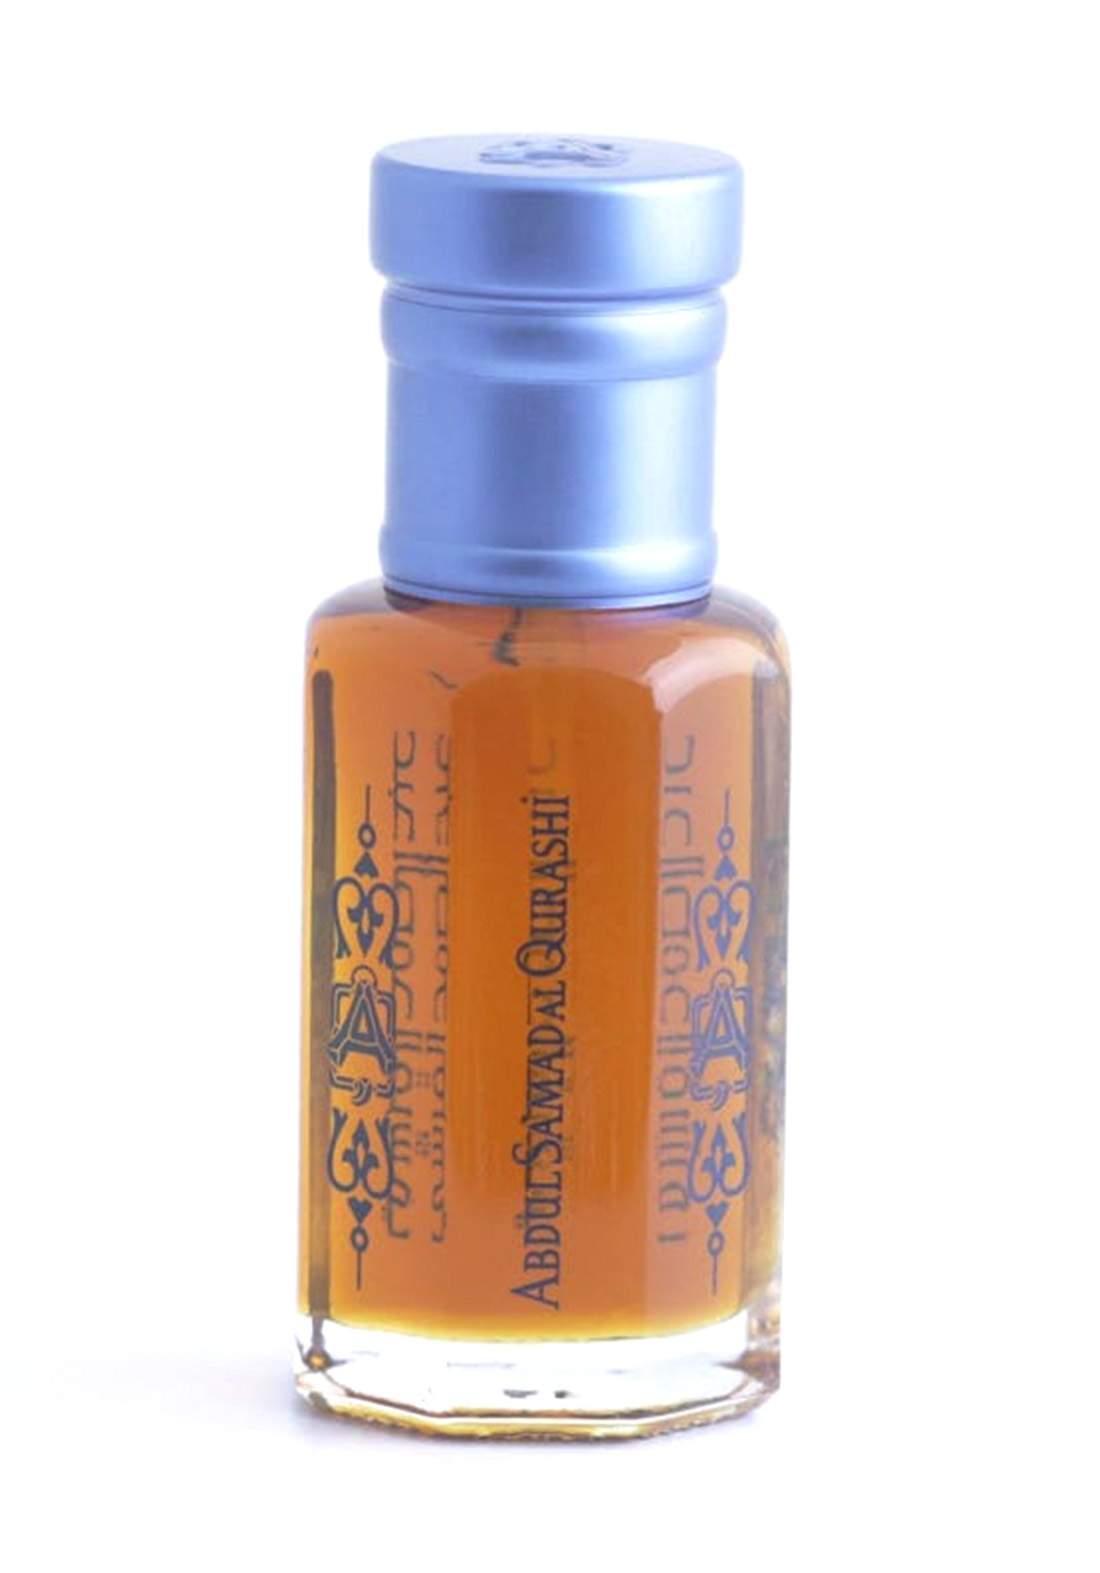 Abdul Samad Al Qurashi 31251 Anas Blend Perfume Oil عطر زيتي رجالي ونسائي